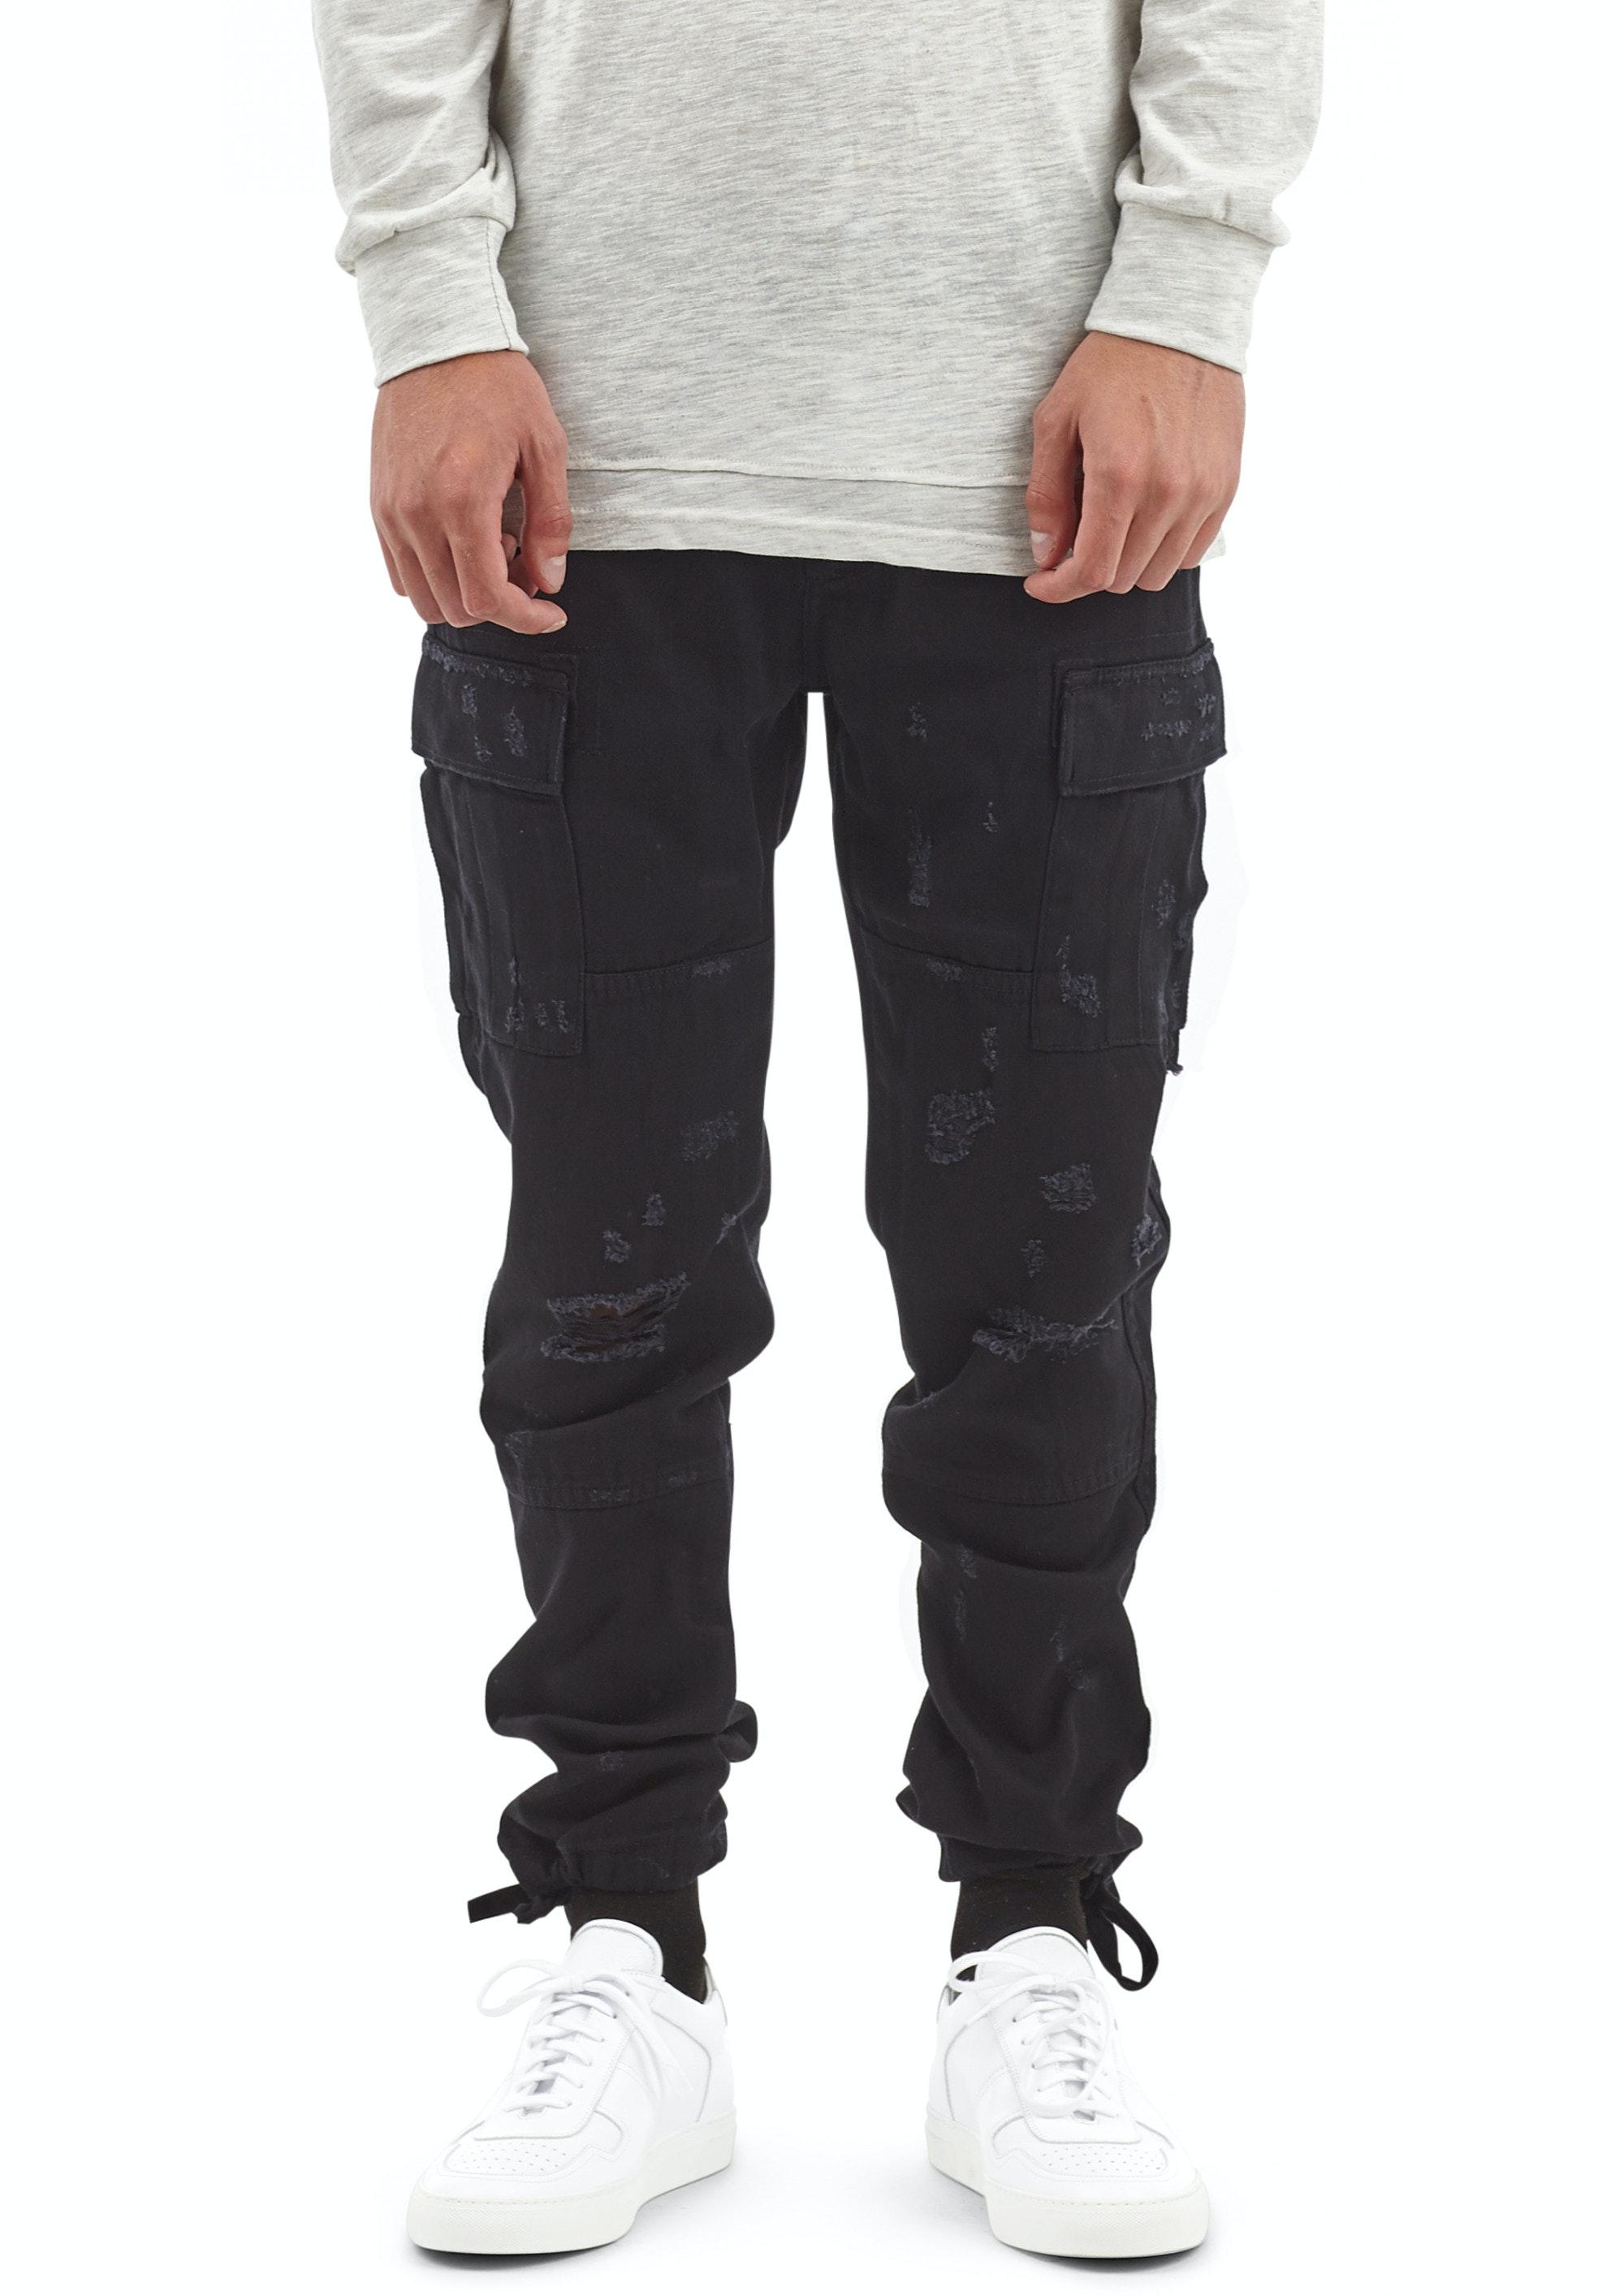 I Love Ugly - CARGO PANT - BLACK